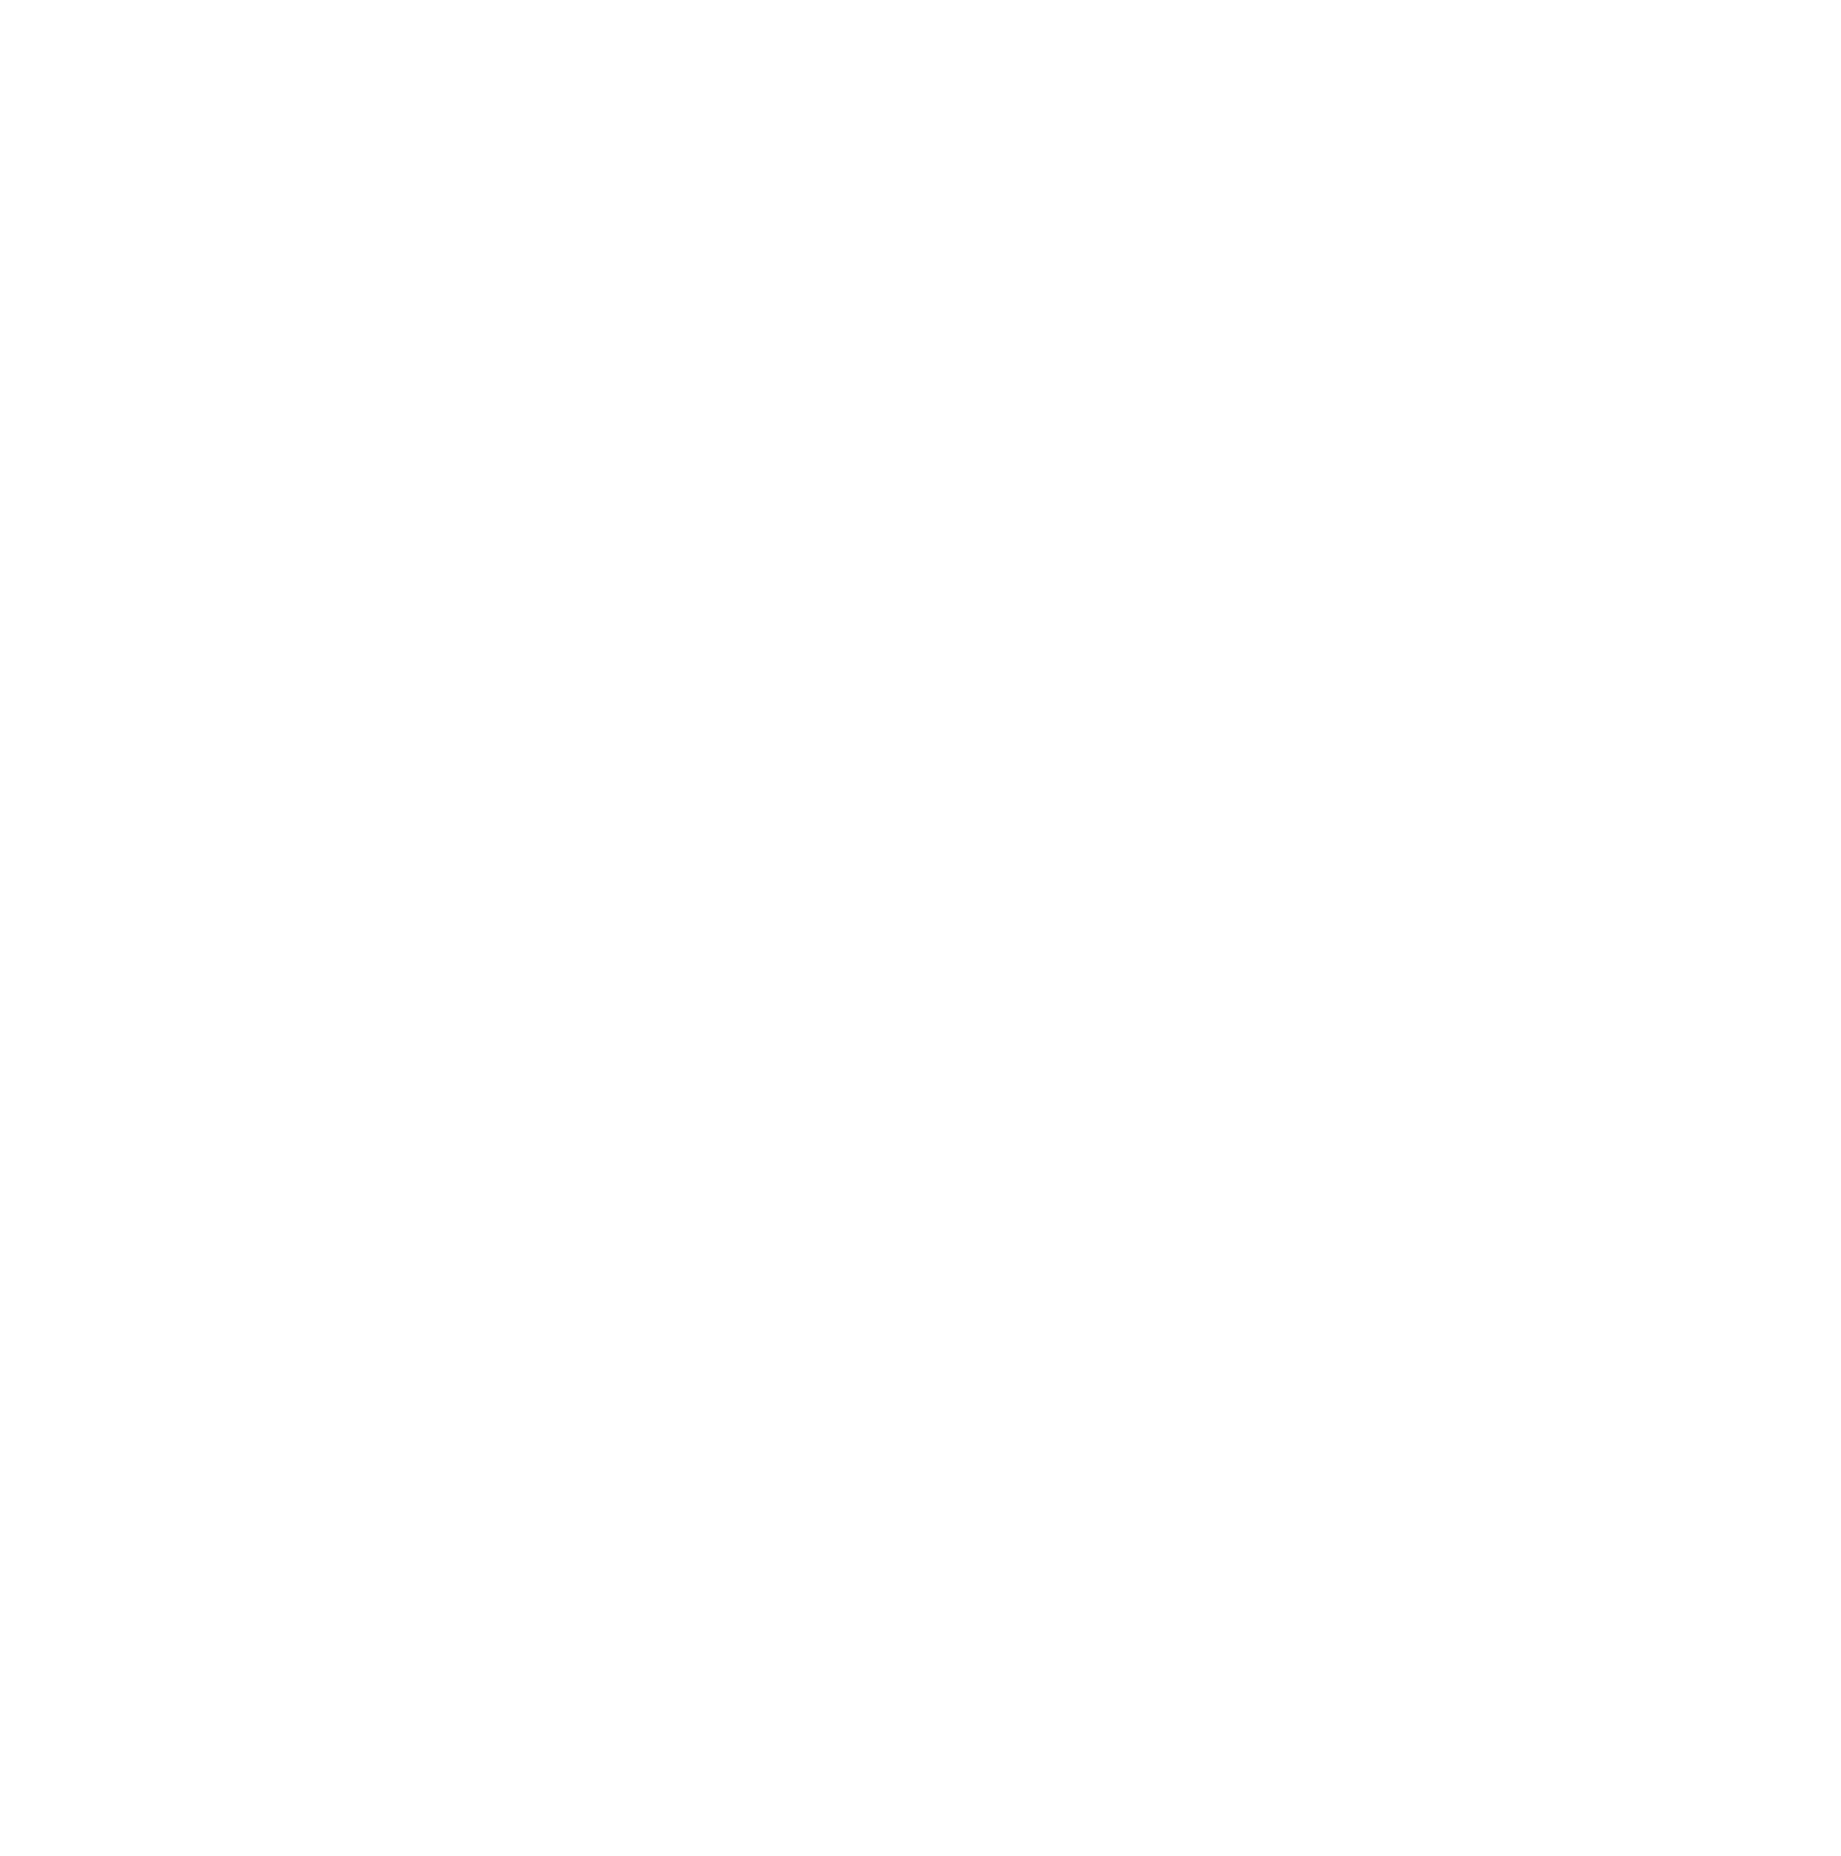 ISTNZ White Logo Transparent